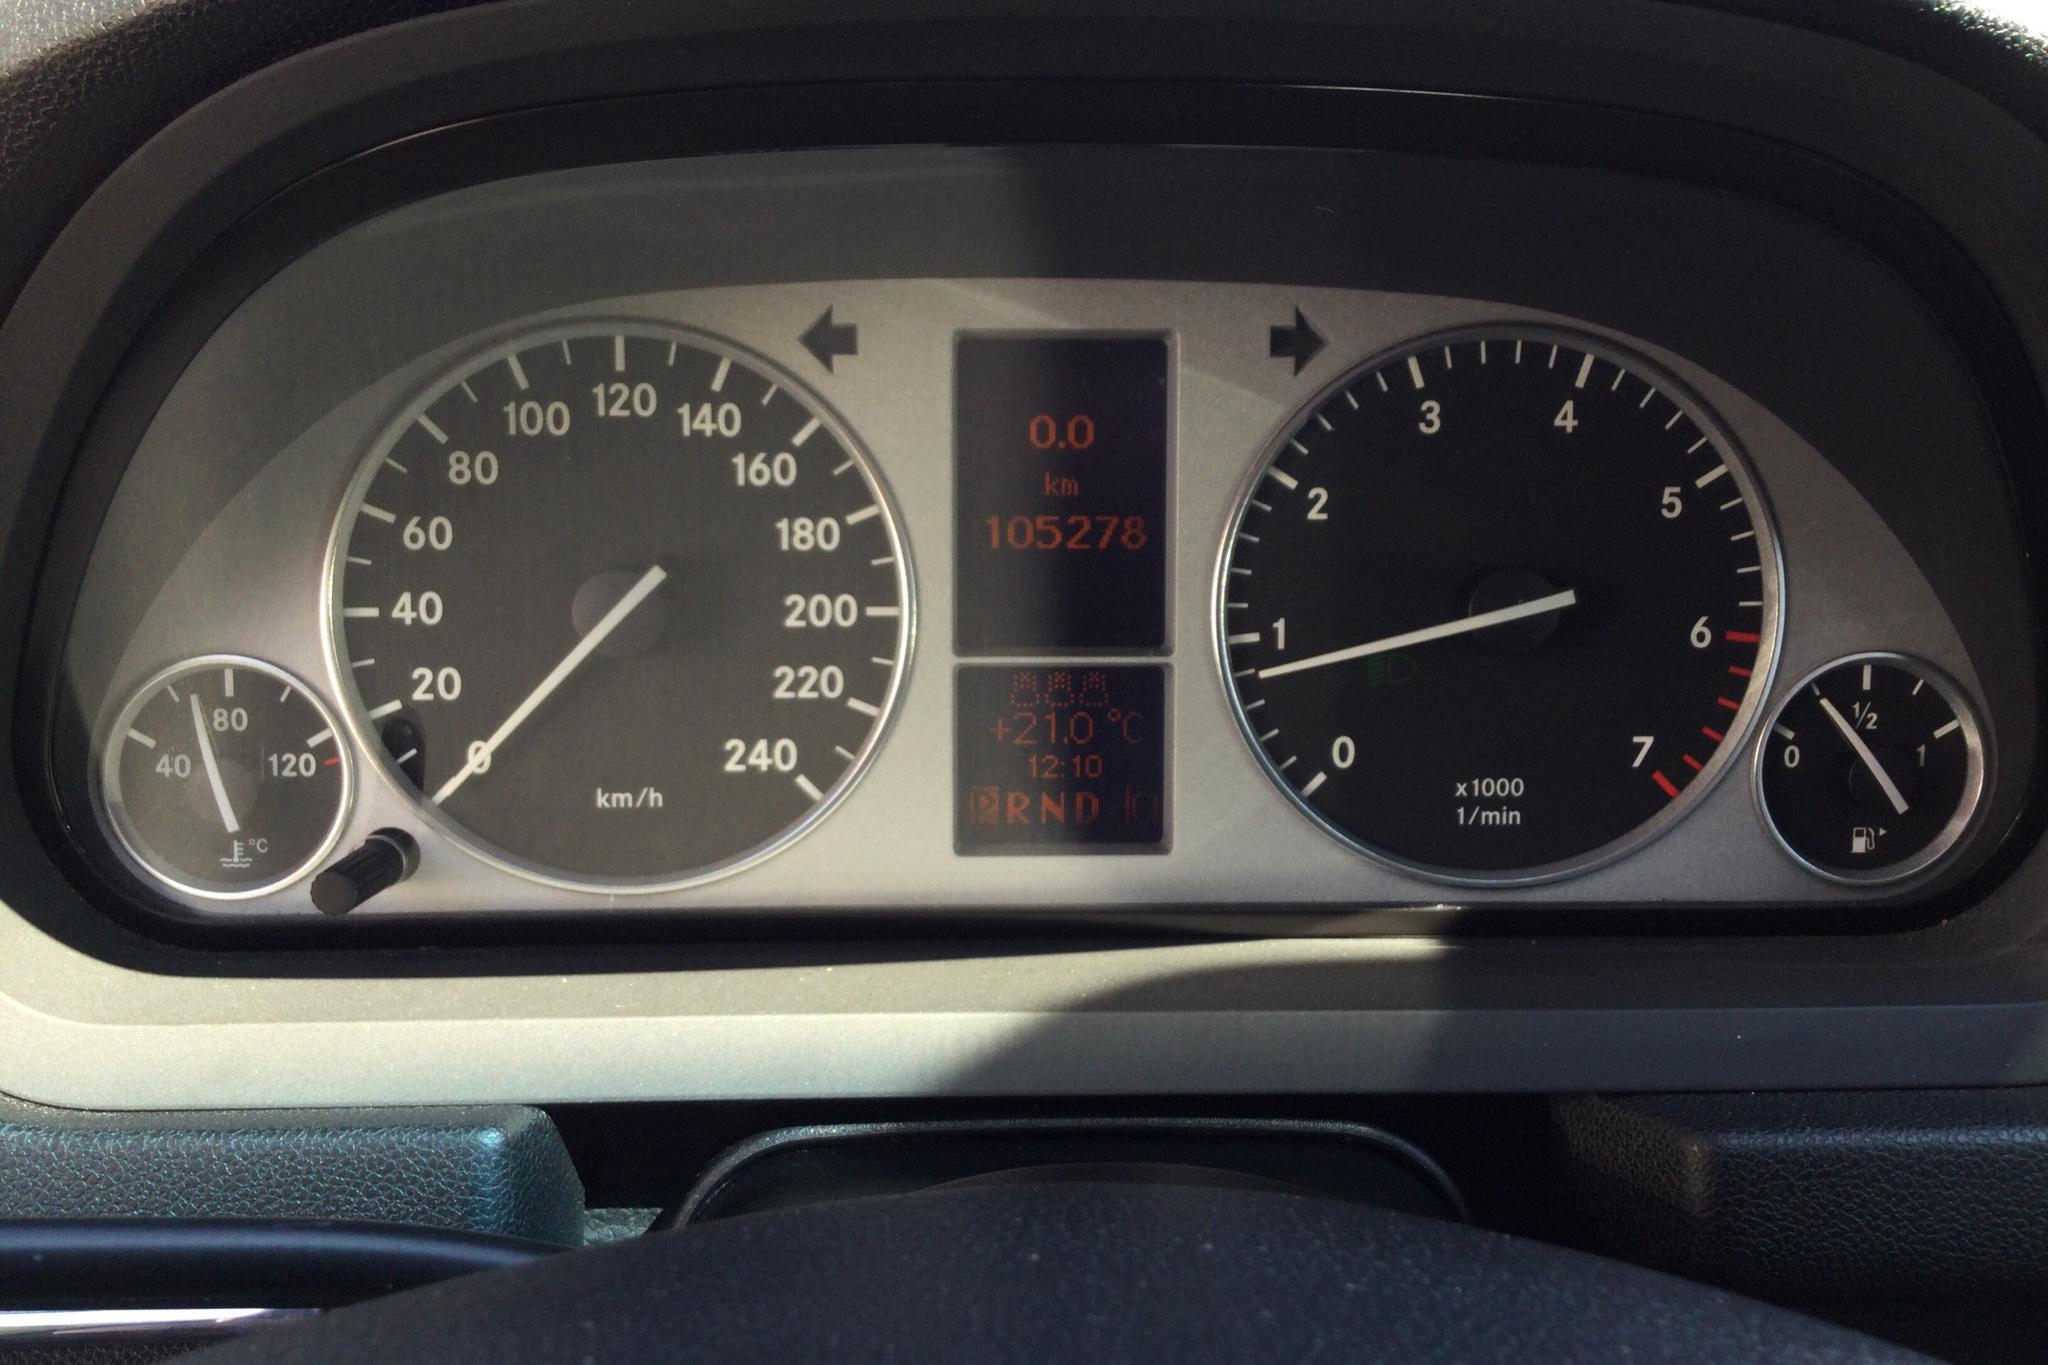 Mercedes B 200 Turbo (193hk) - 105 270 km - Automatic - black - 2006